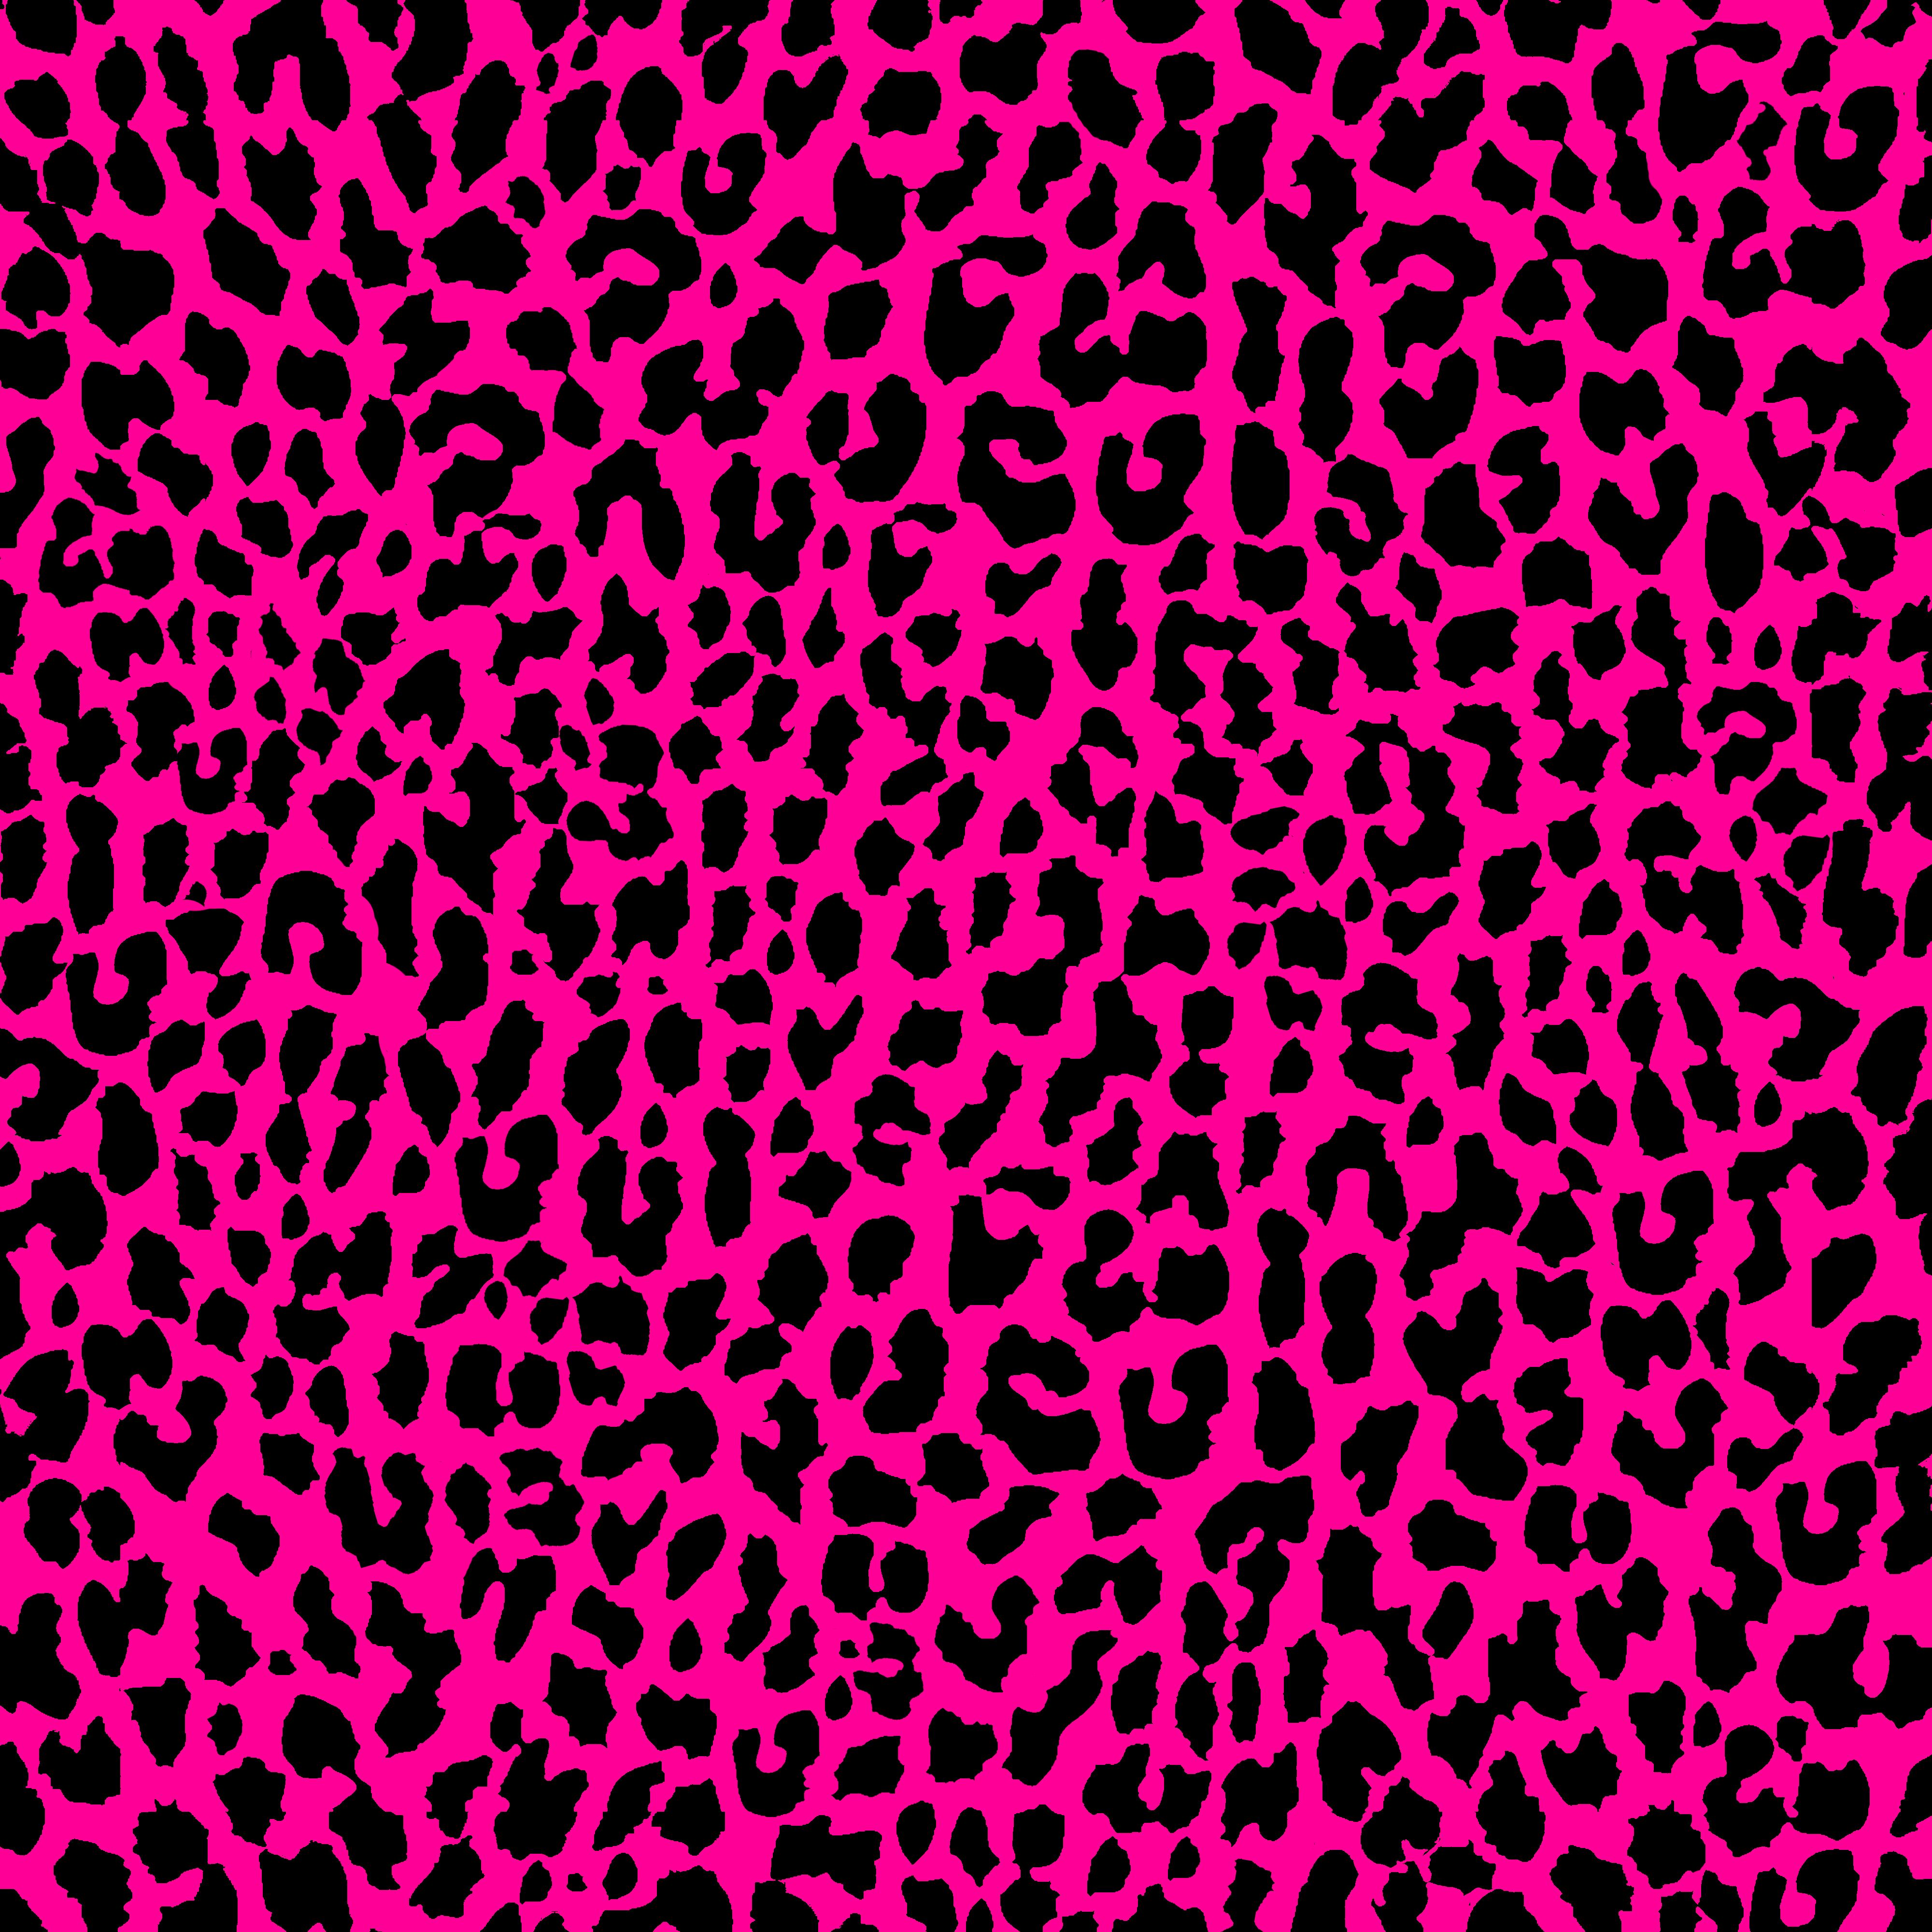 Pink leopard print background